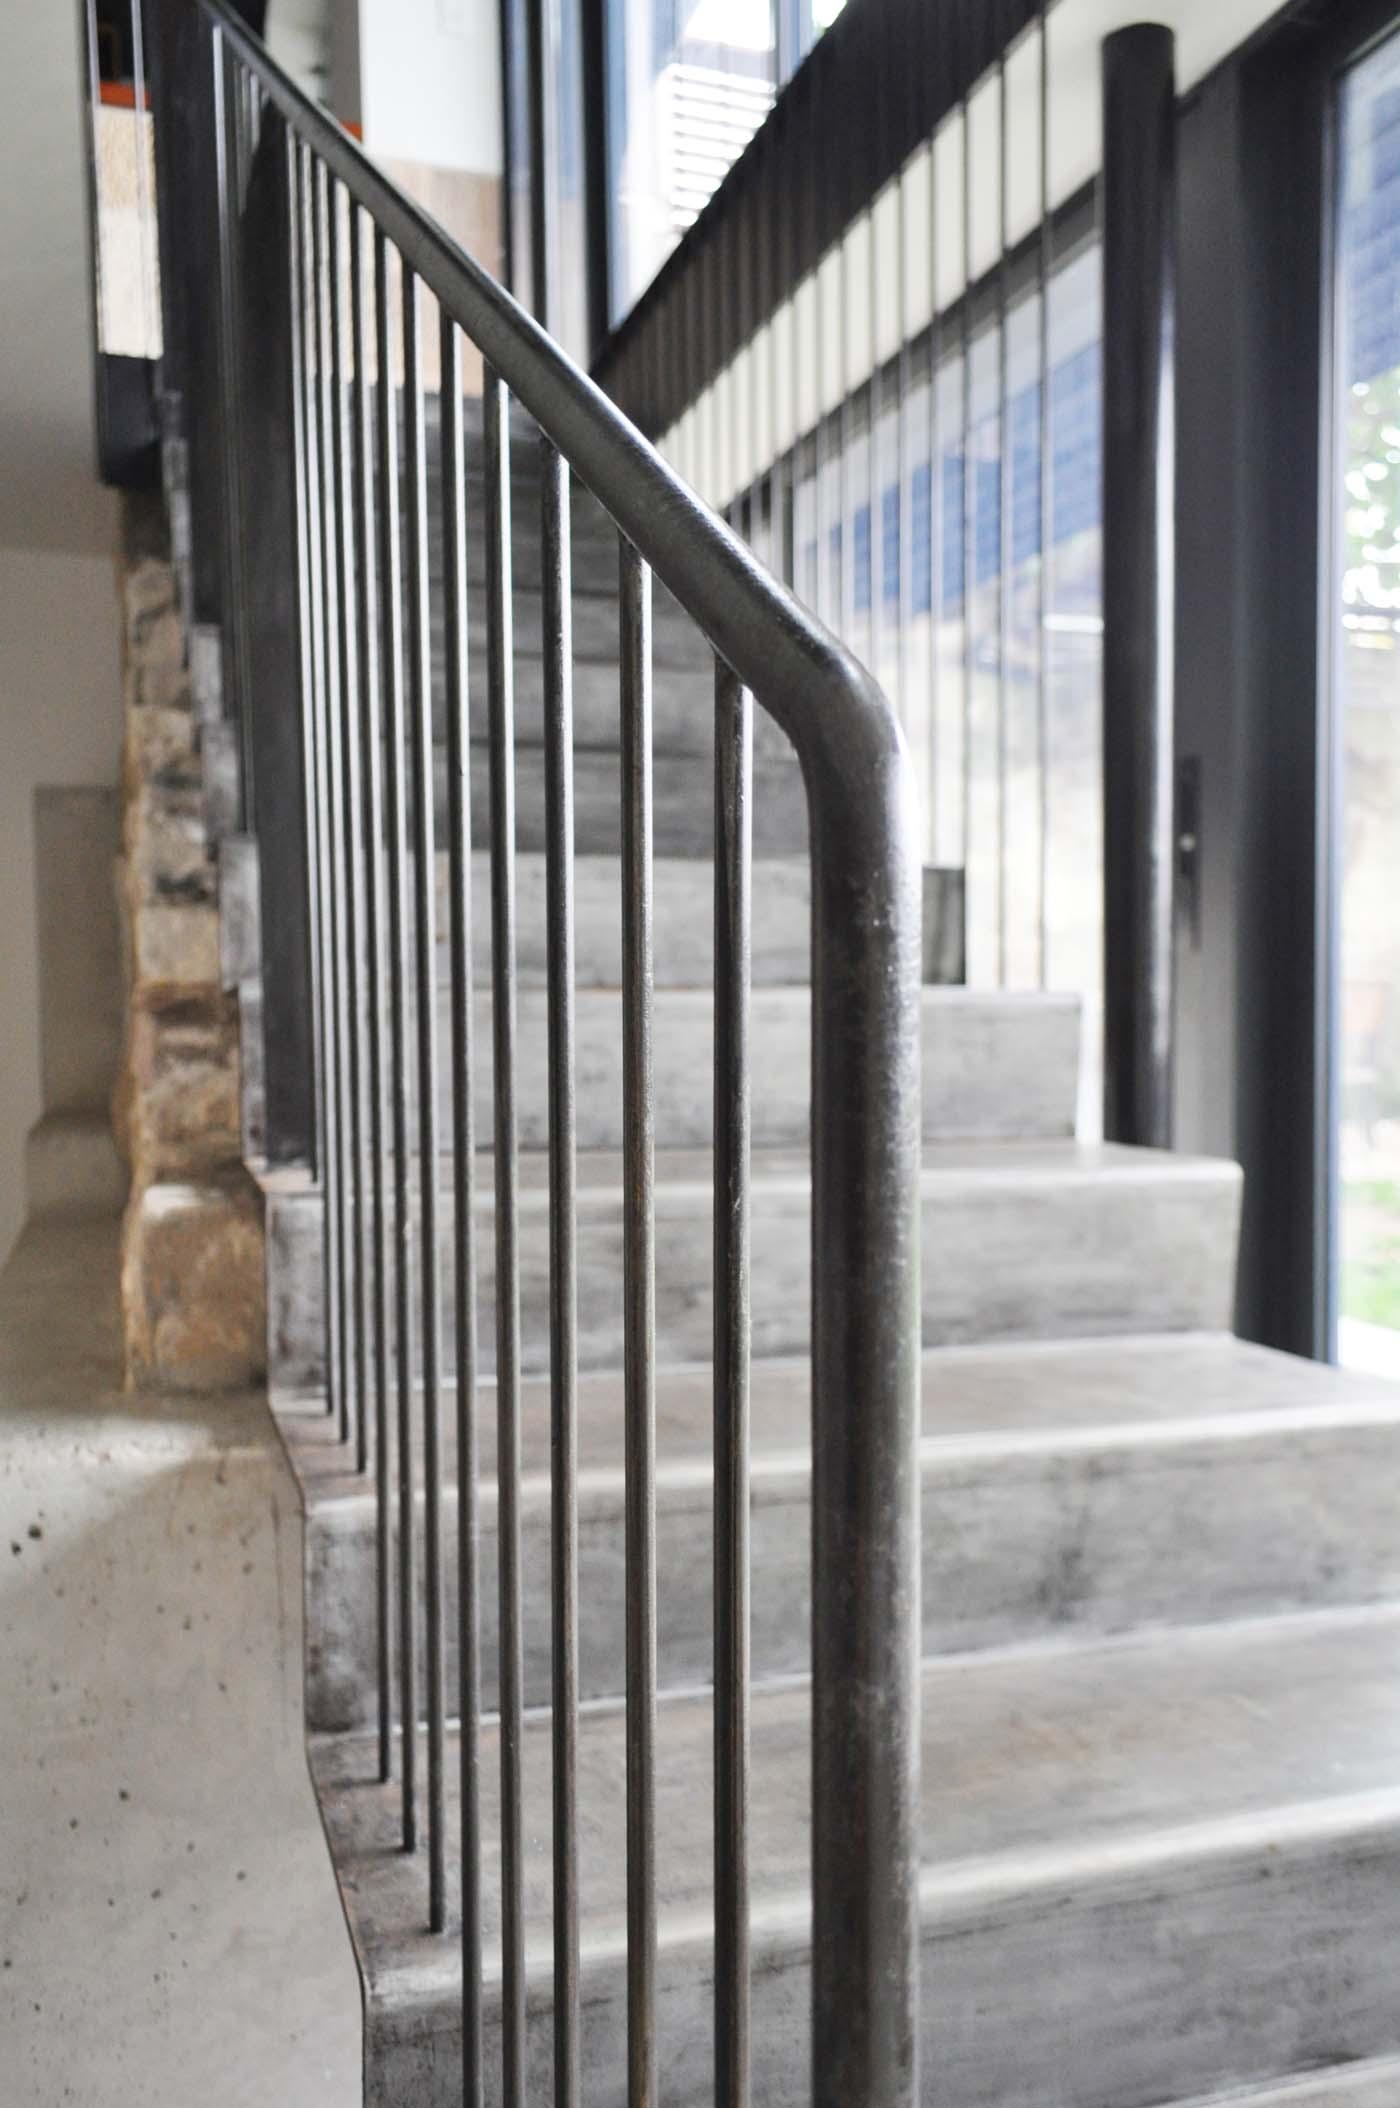 Balmain Cottage by award winning Sydney firm Sam Crawford Architects. Detail of tubular black steel handrail with balustrade